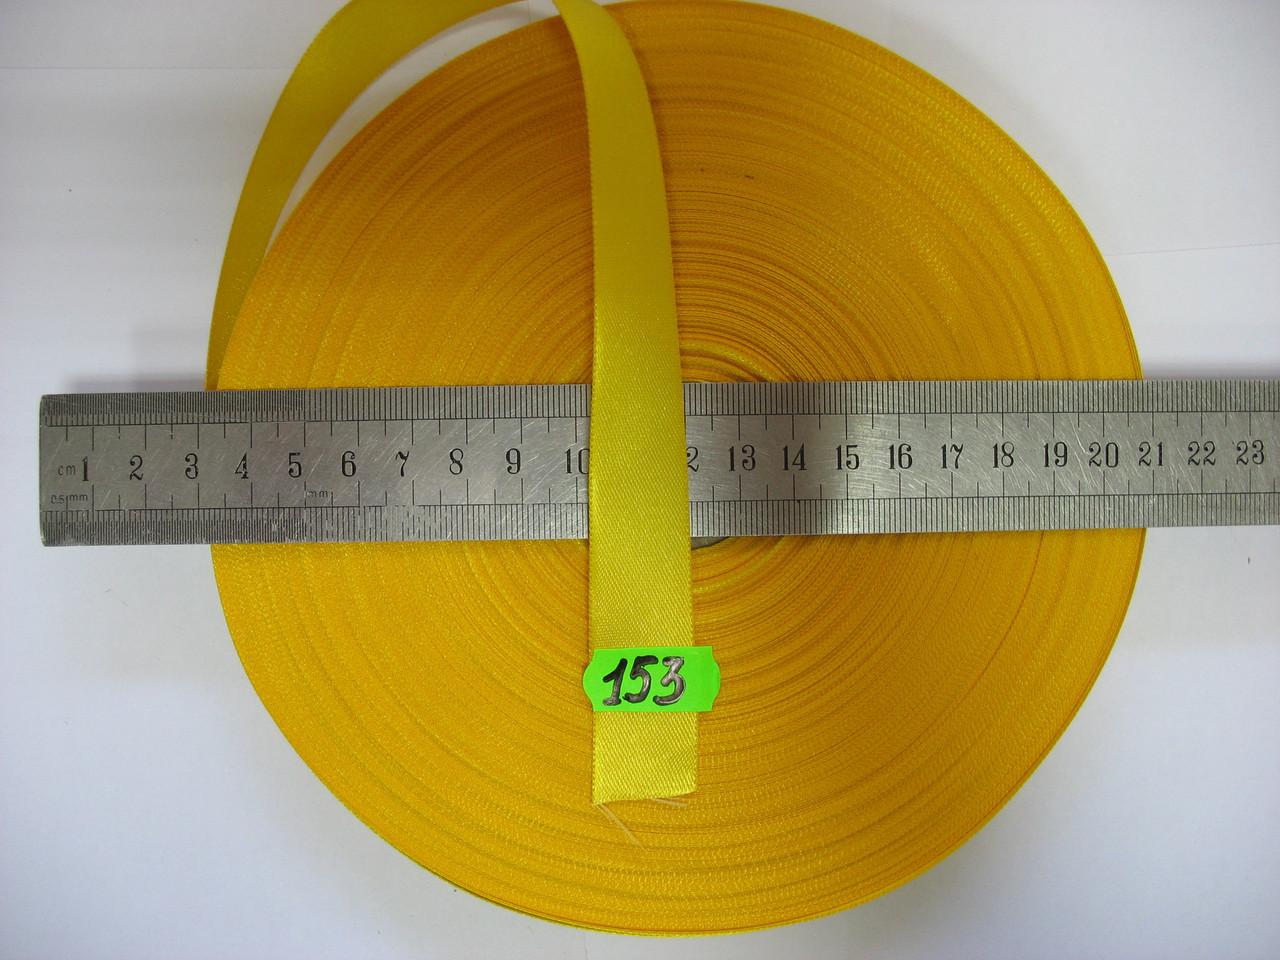 Лента атласная двухсторонняя 20мм, цвет темно-желтый, Турция